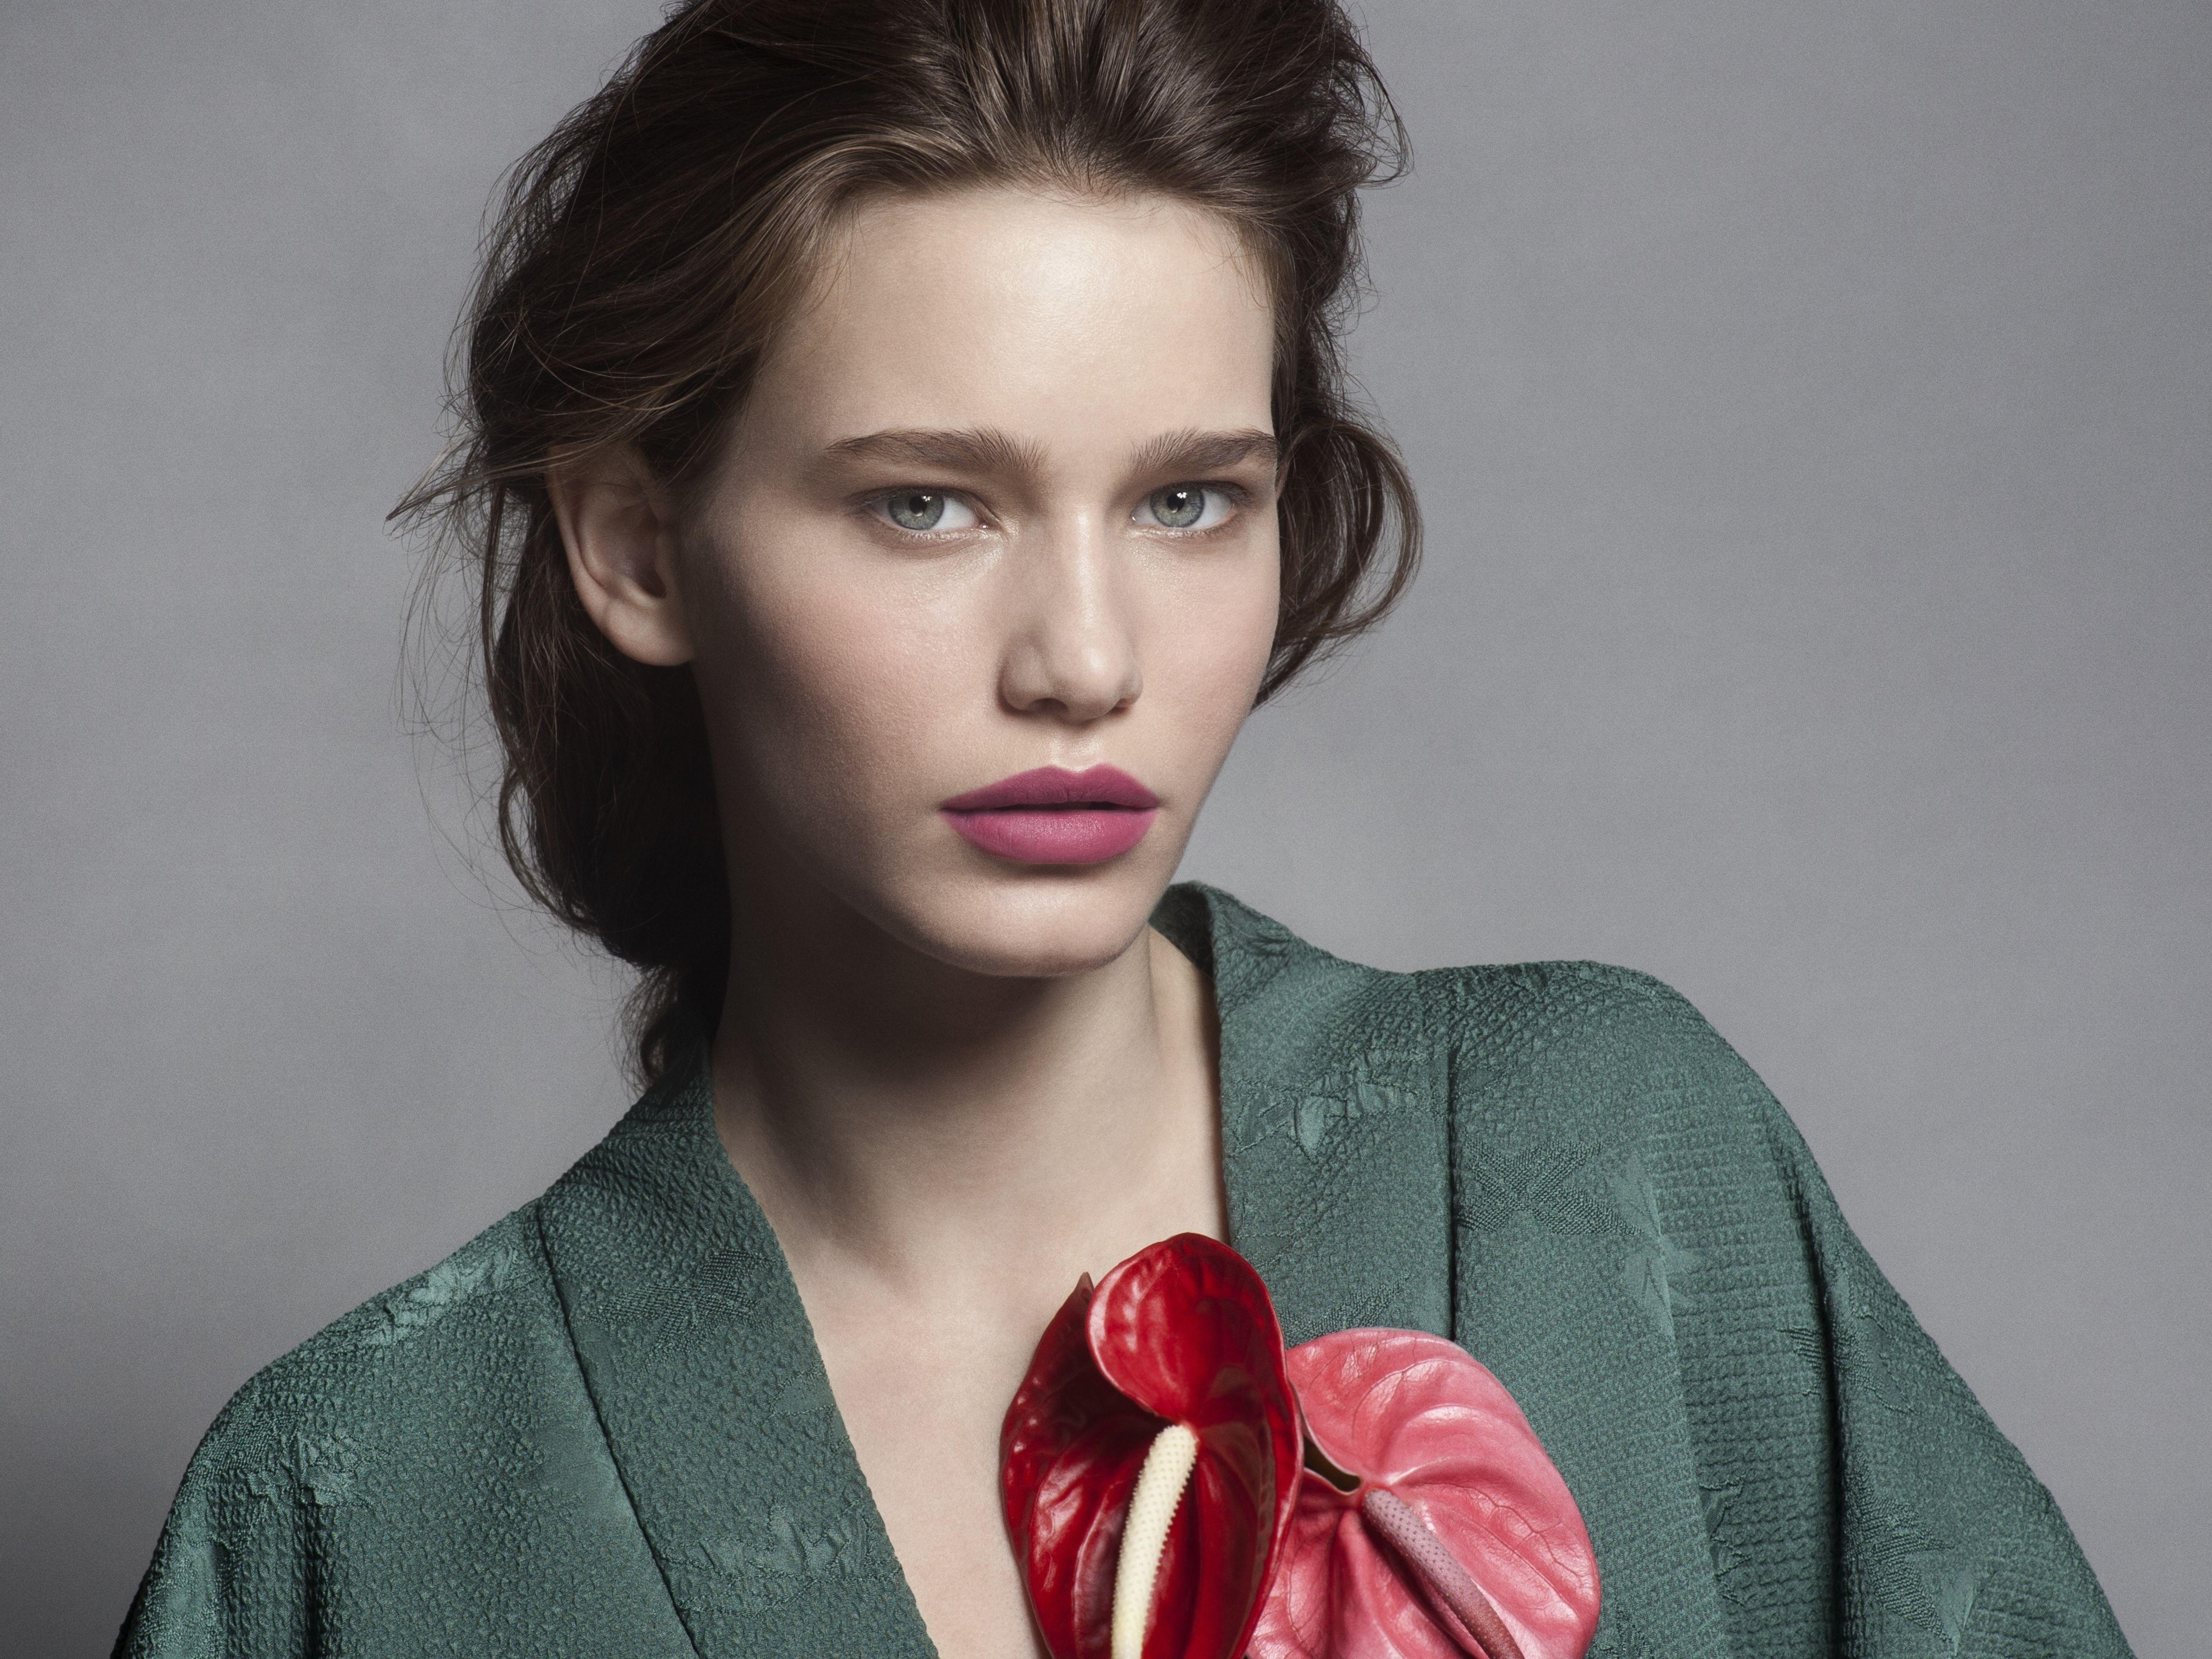 Lipstick empower jgmdb1